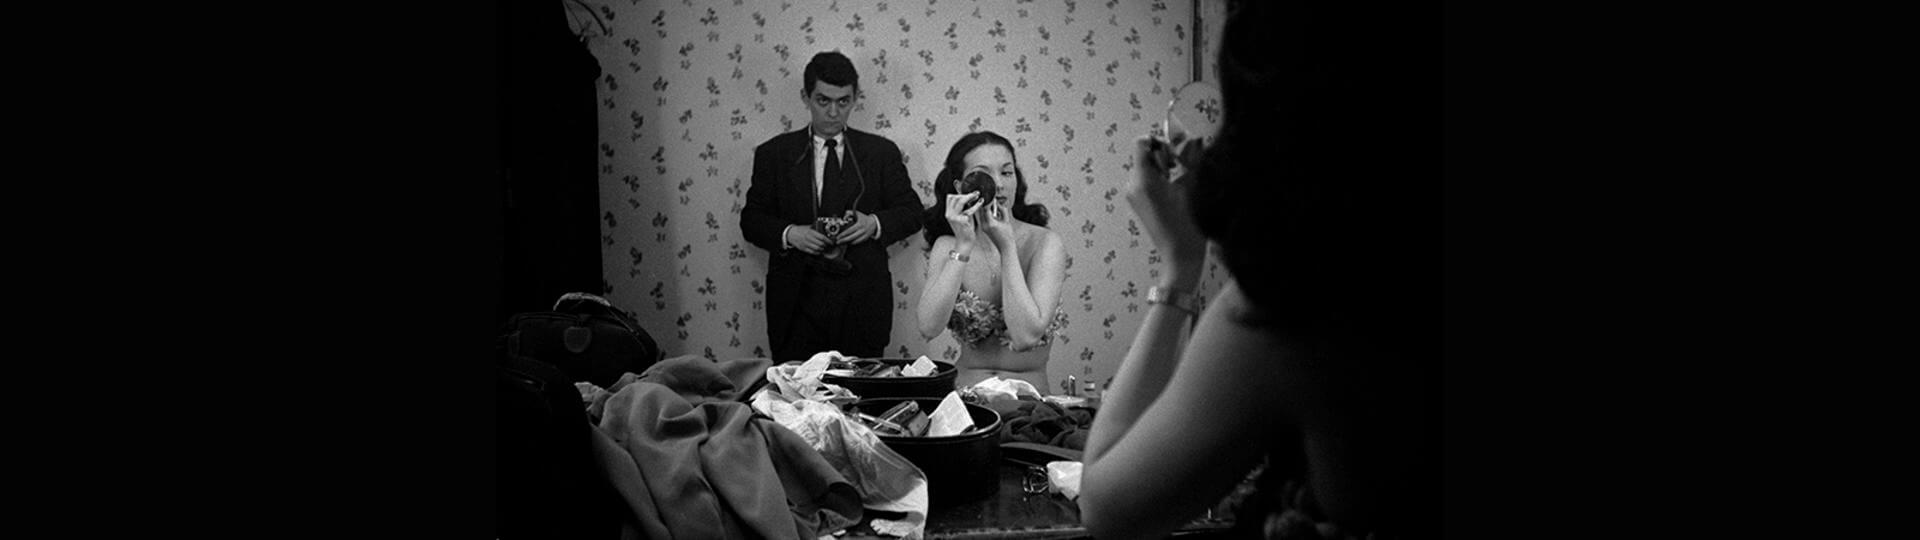 Mark Your Calendar: Stanley Kubrick